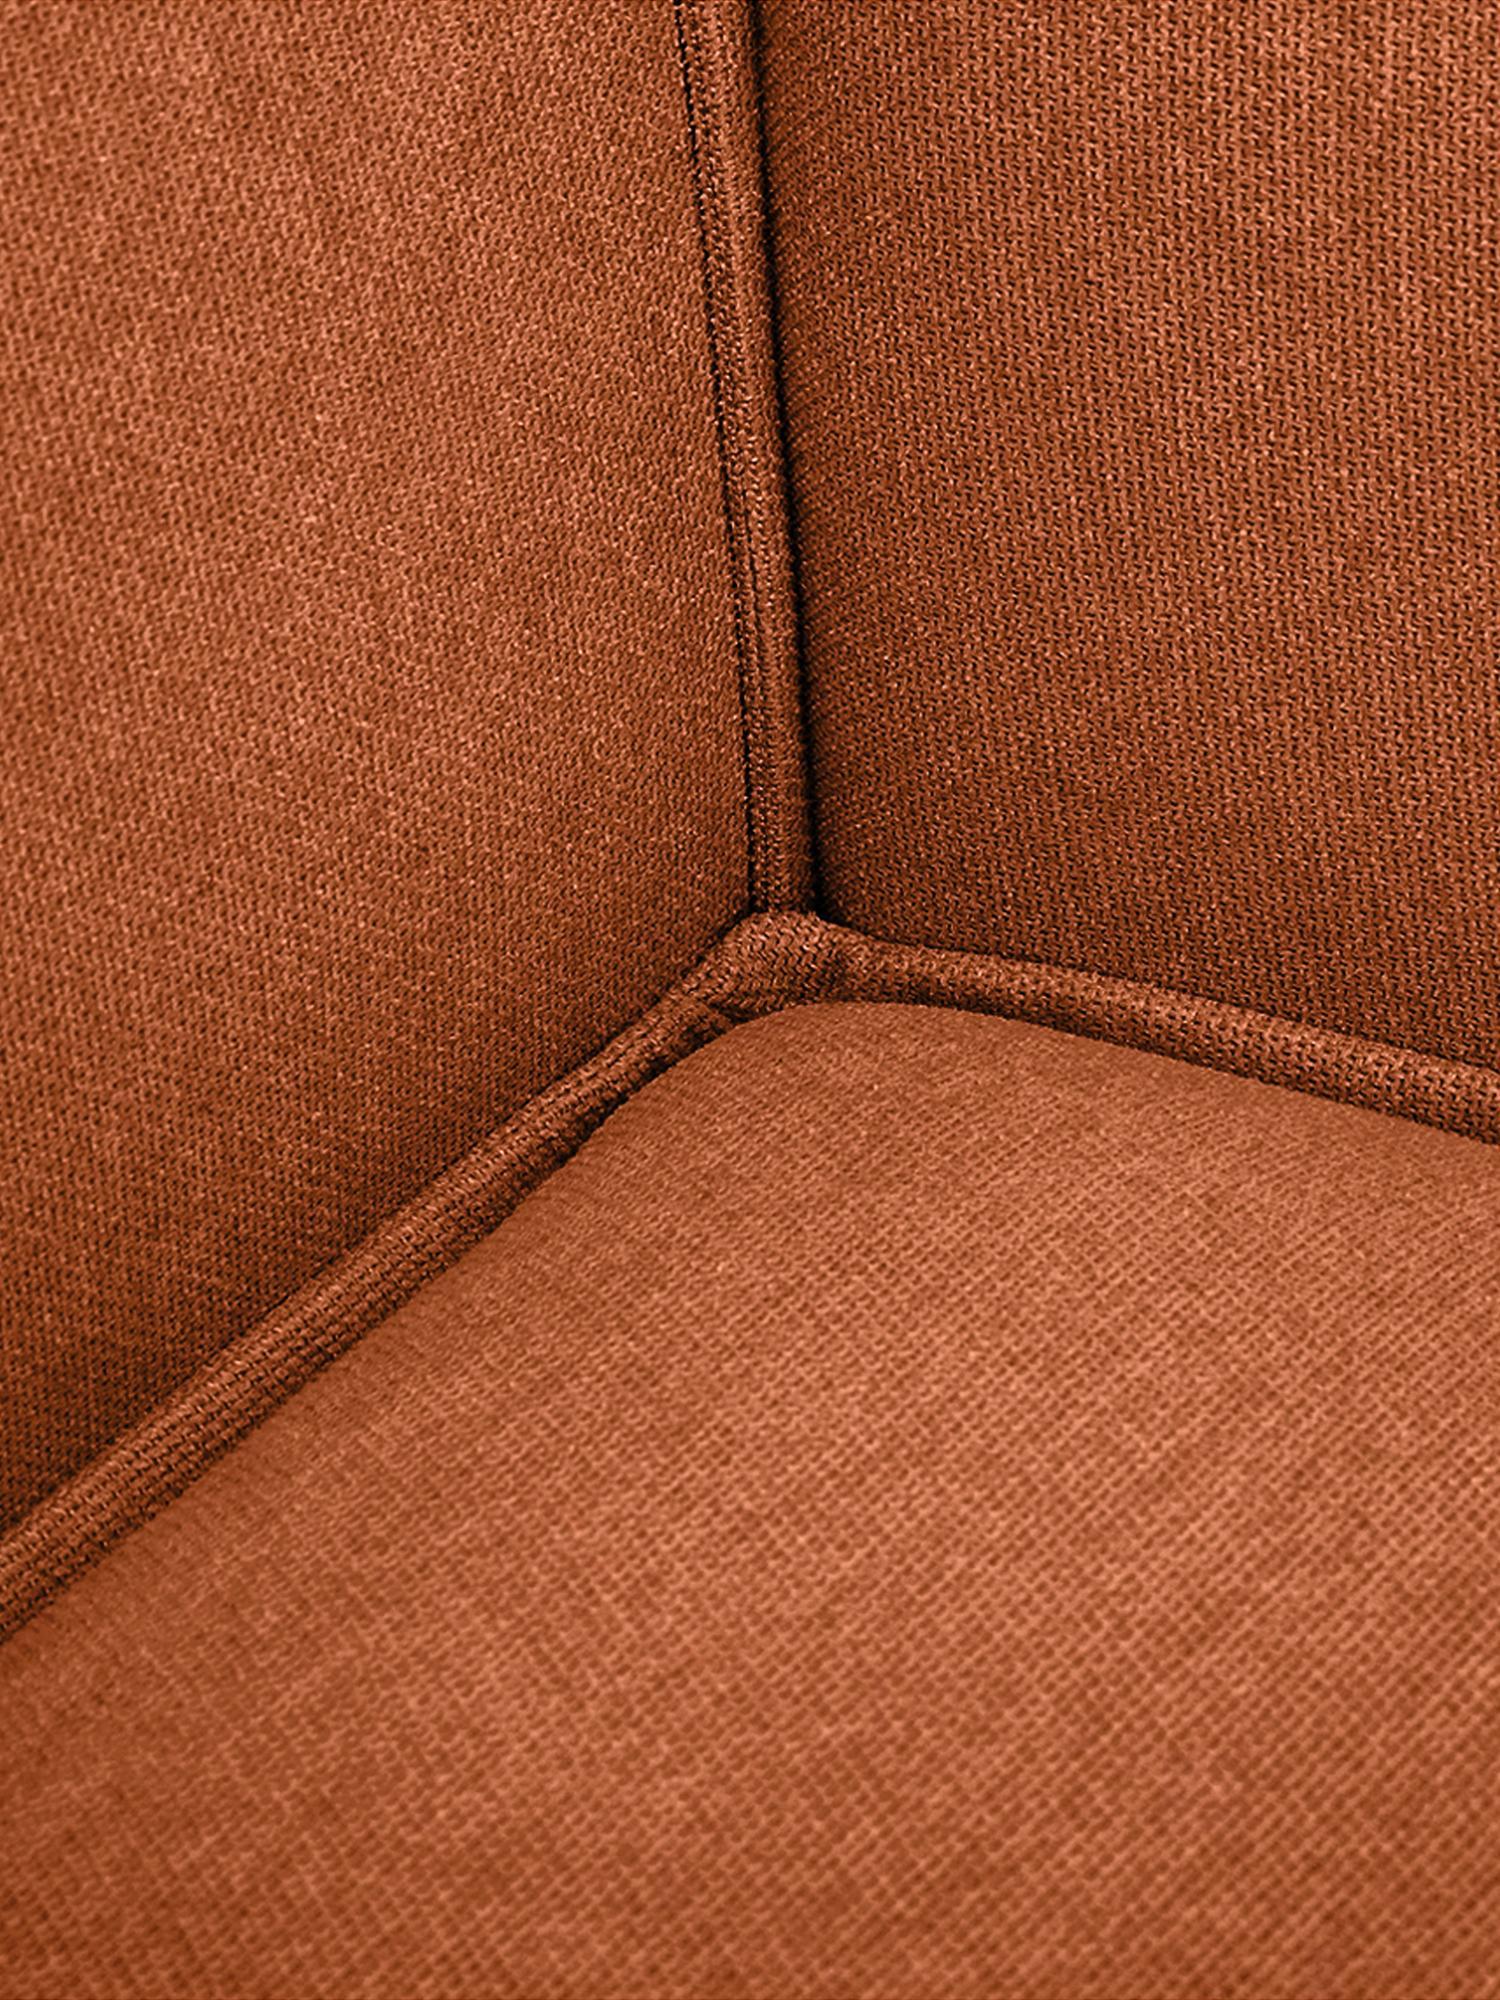 Modulares Sofa Lennon (3-Sitzer), Bezug: Polyester Der hochwertige, Gestell: Massives Kiefernholz, Spe, Füße: Kunststoff, Webstoff Terrakotta, B 238 x T 119 cm